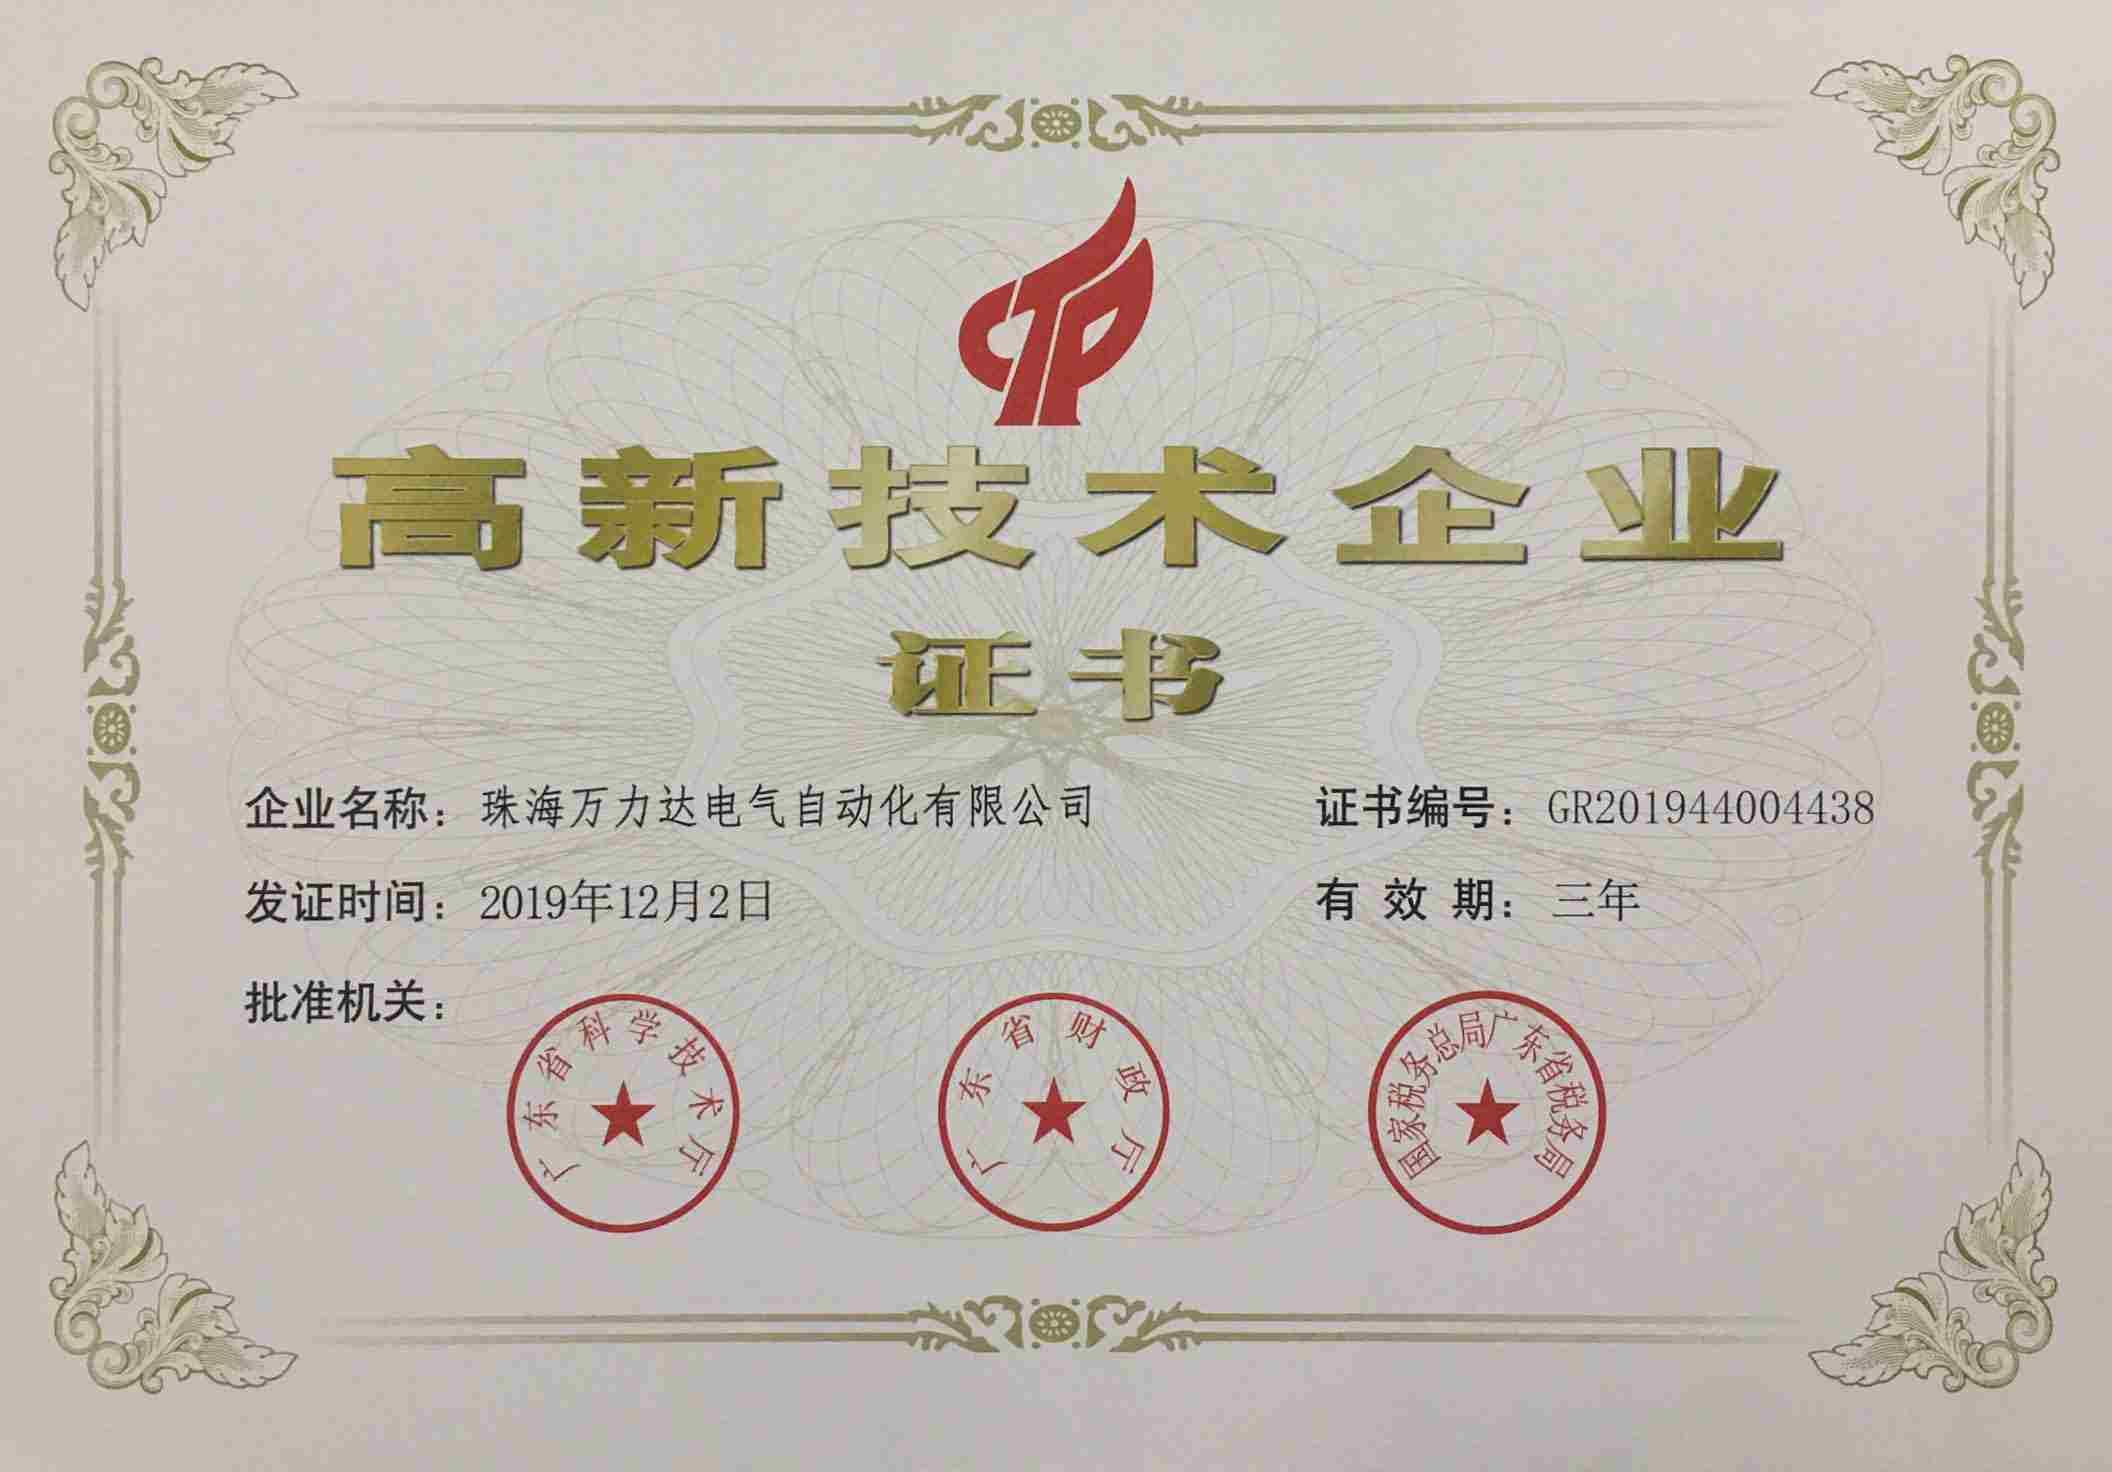 <span>高新技术企业证书</span>